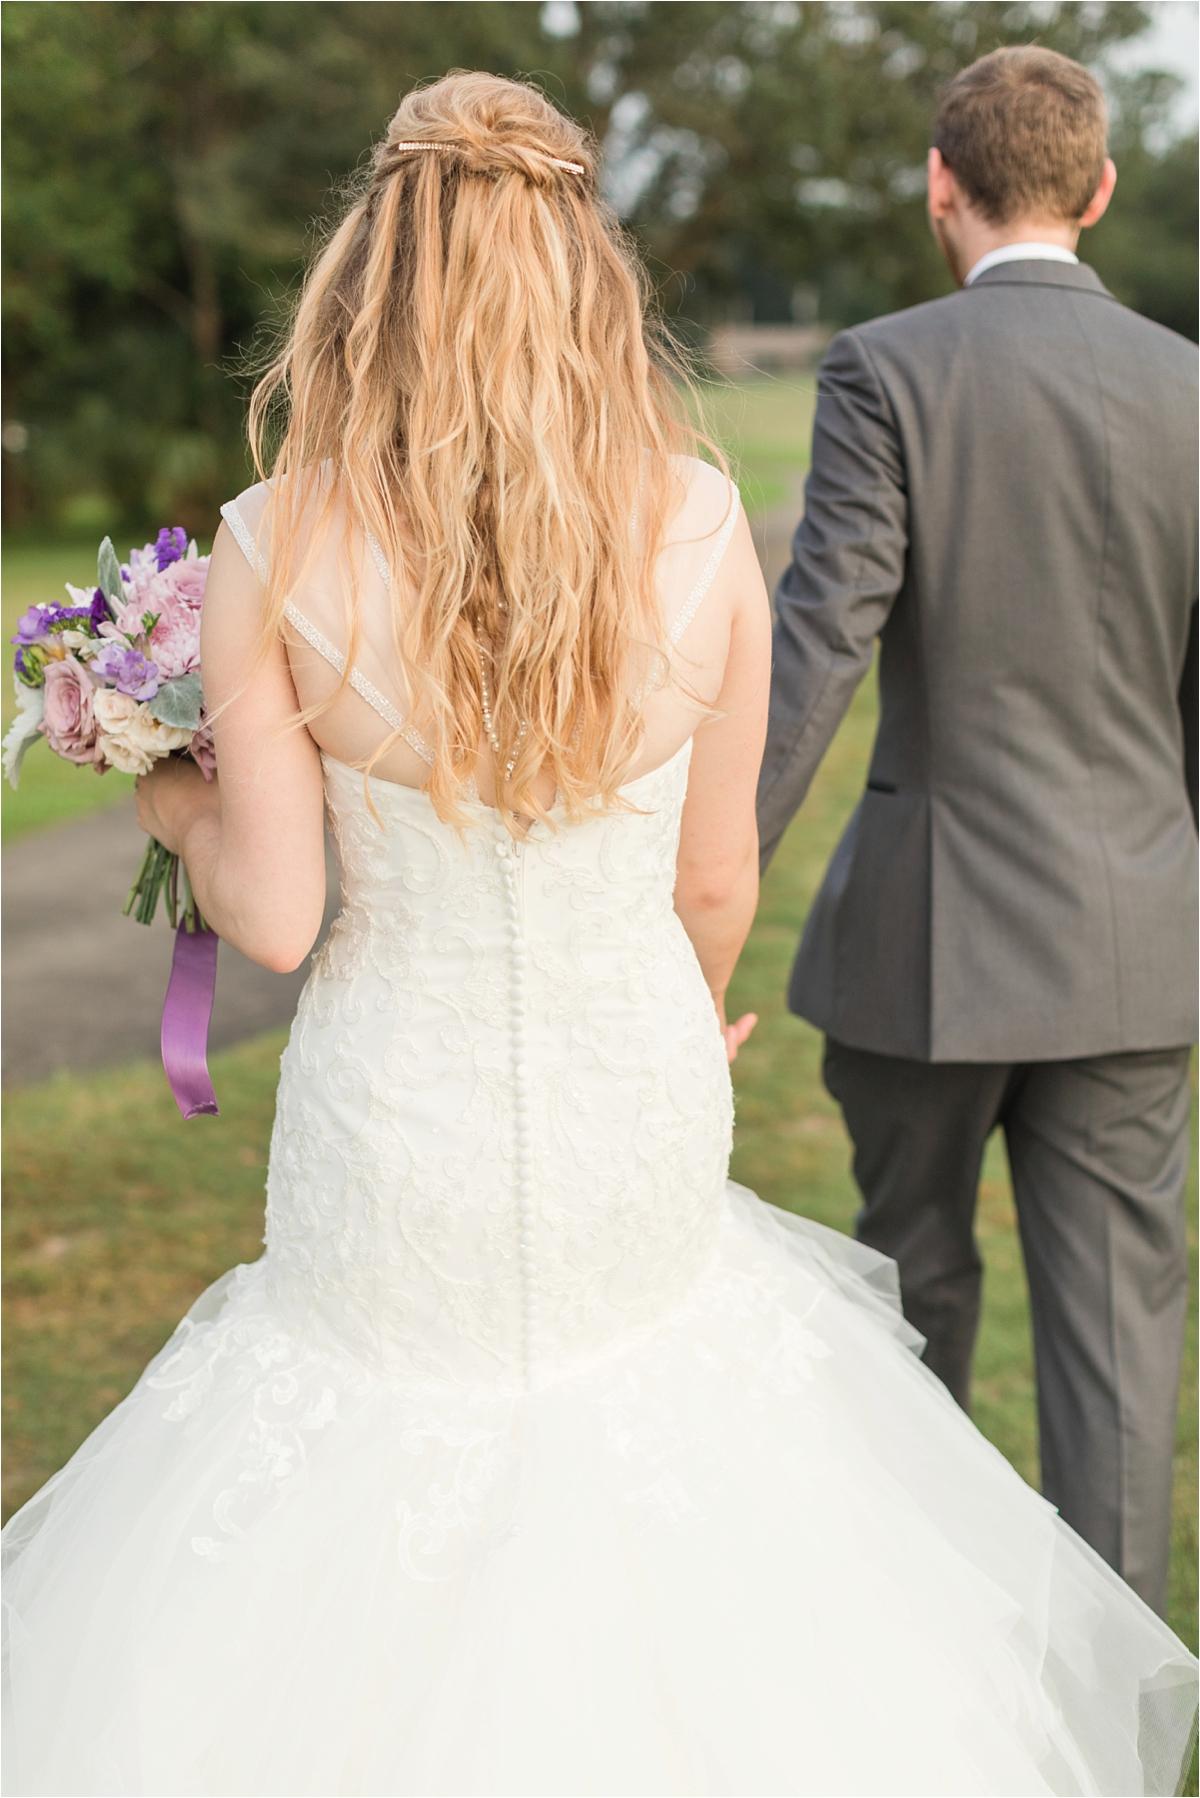 bride-groom-photos-portraits-alabama-wedding-photographer-mermaid-wedding-dress